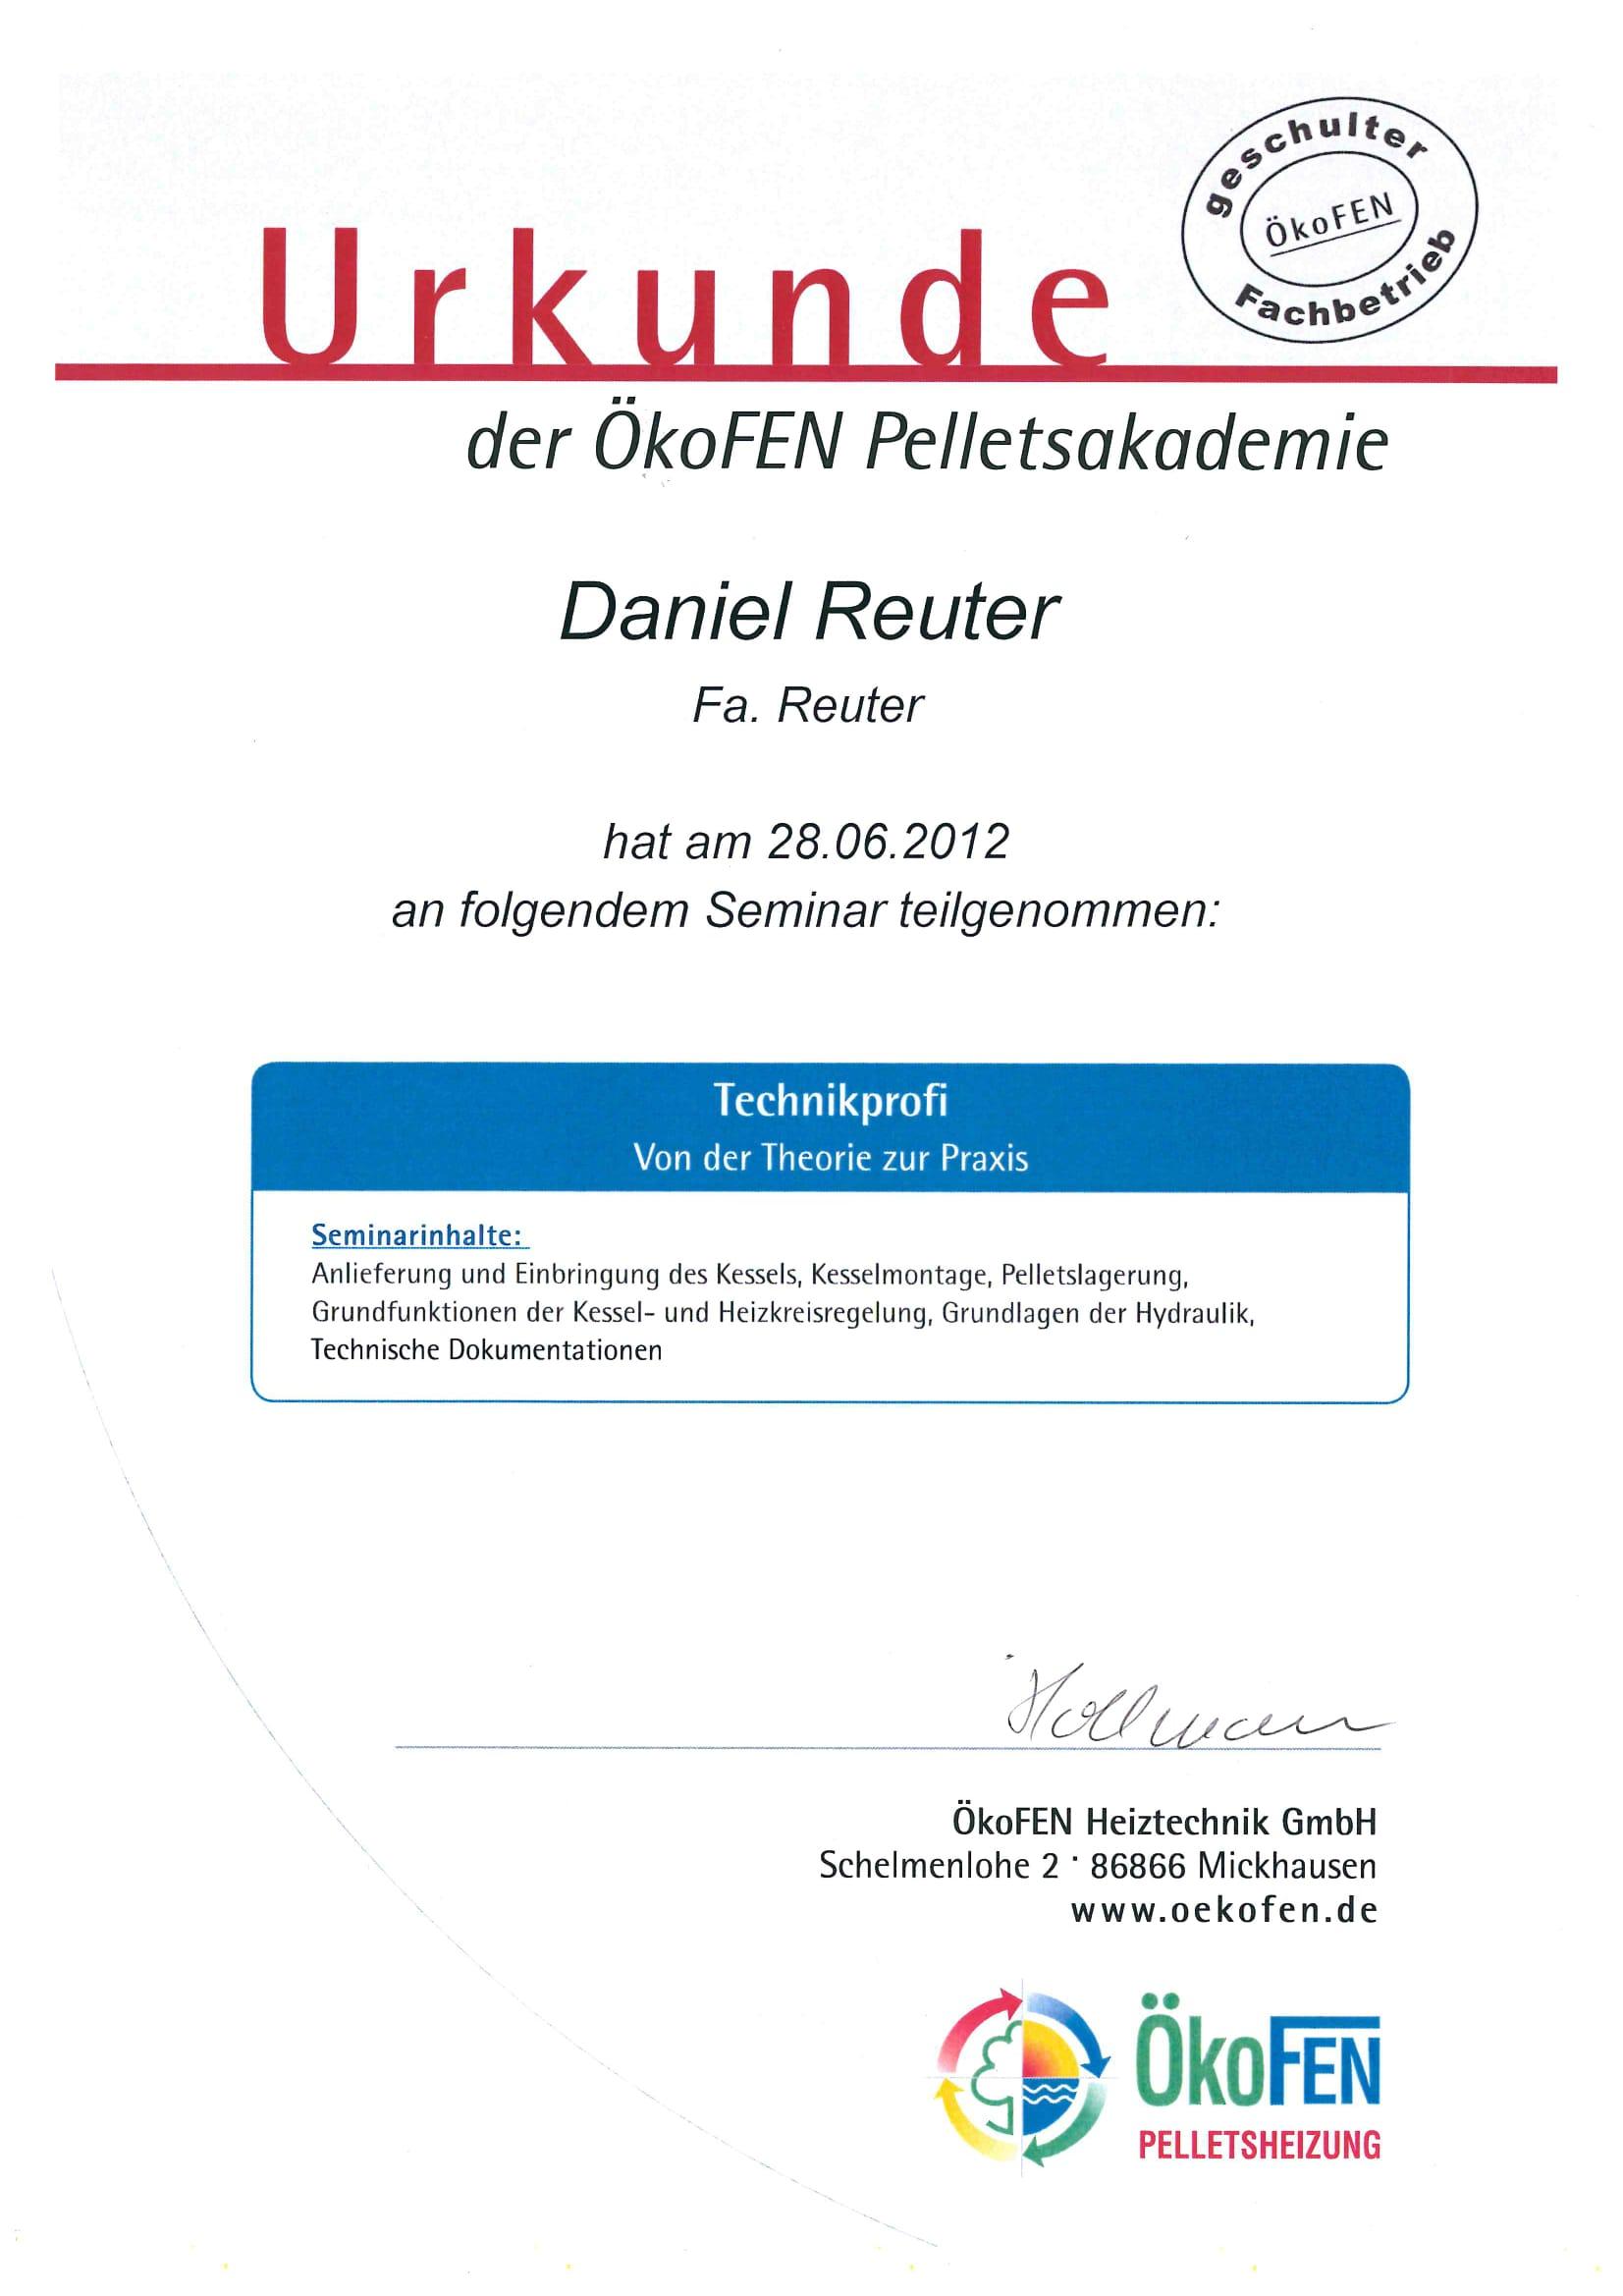 Zertifikate | Daniel Reuter | Sanitär-, Heizung-, Klimatechnik